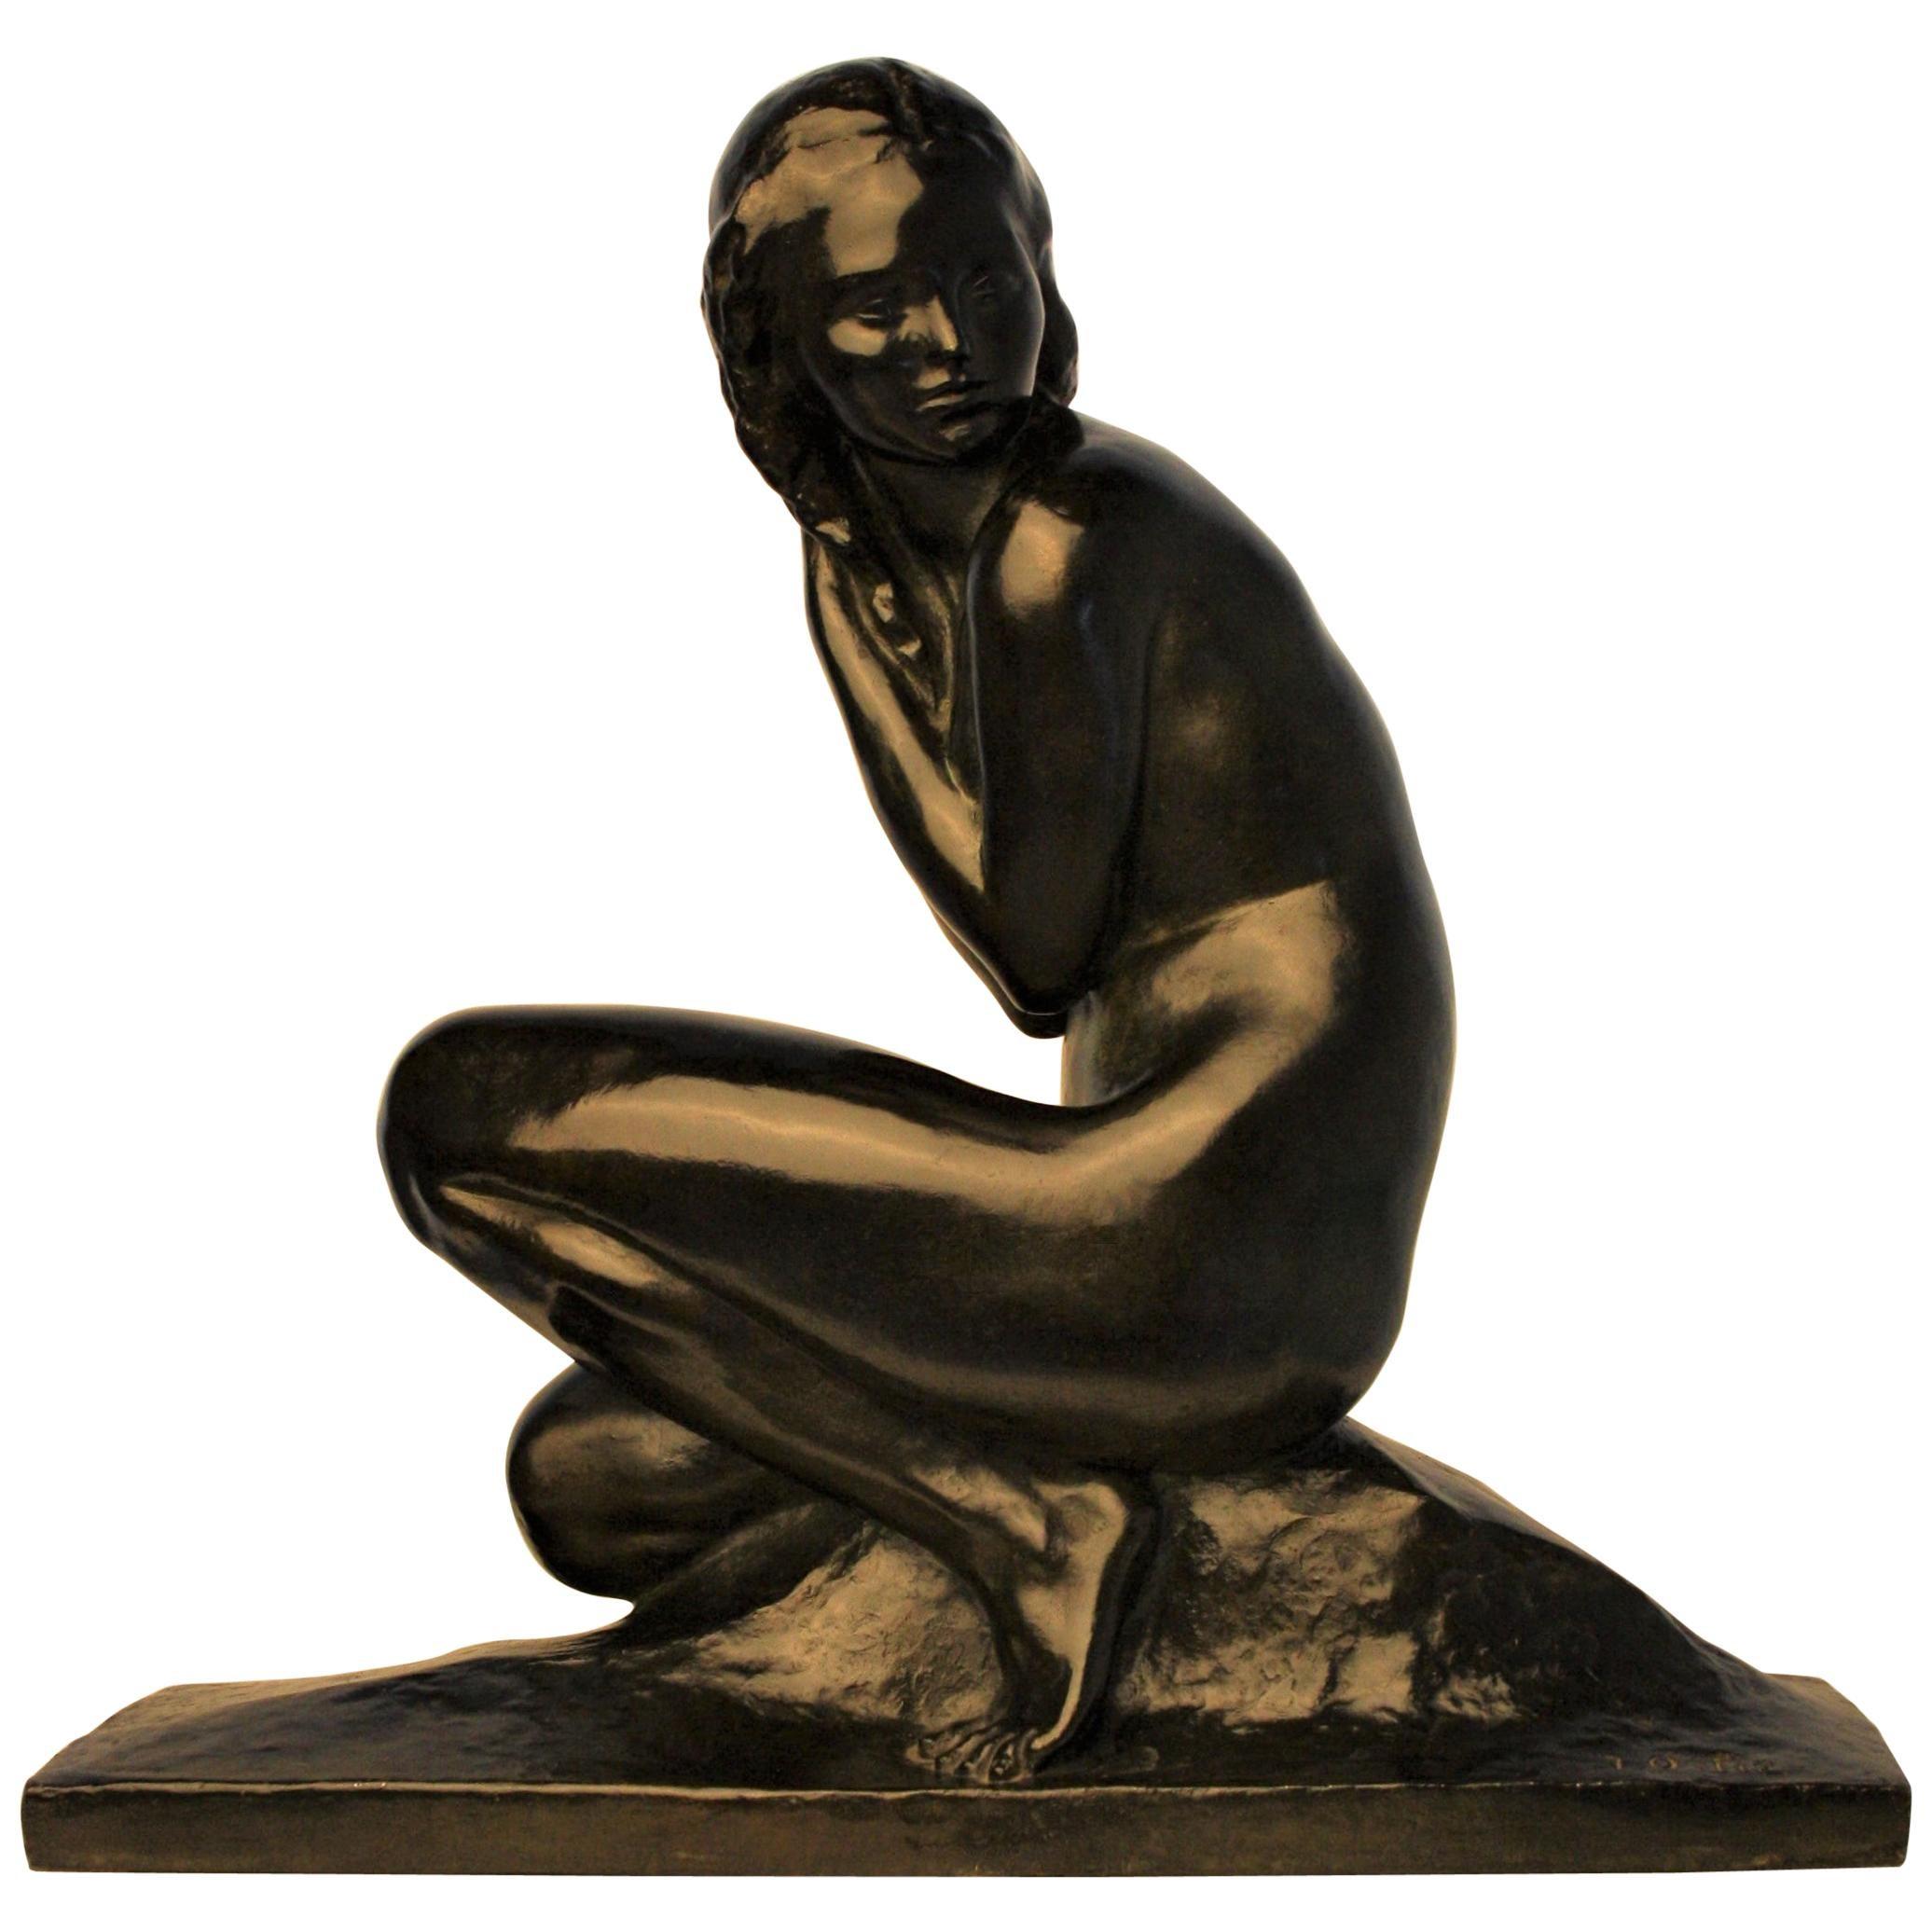 Art Deco Bronze Sculpture by Jean Ortis, 1930